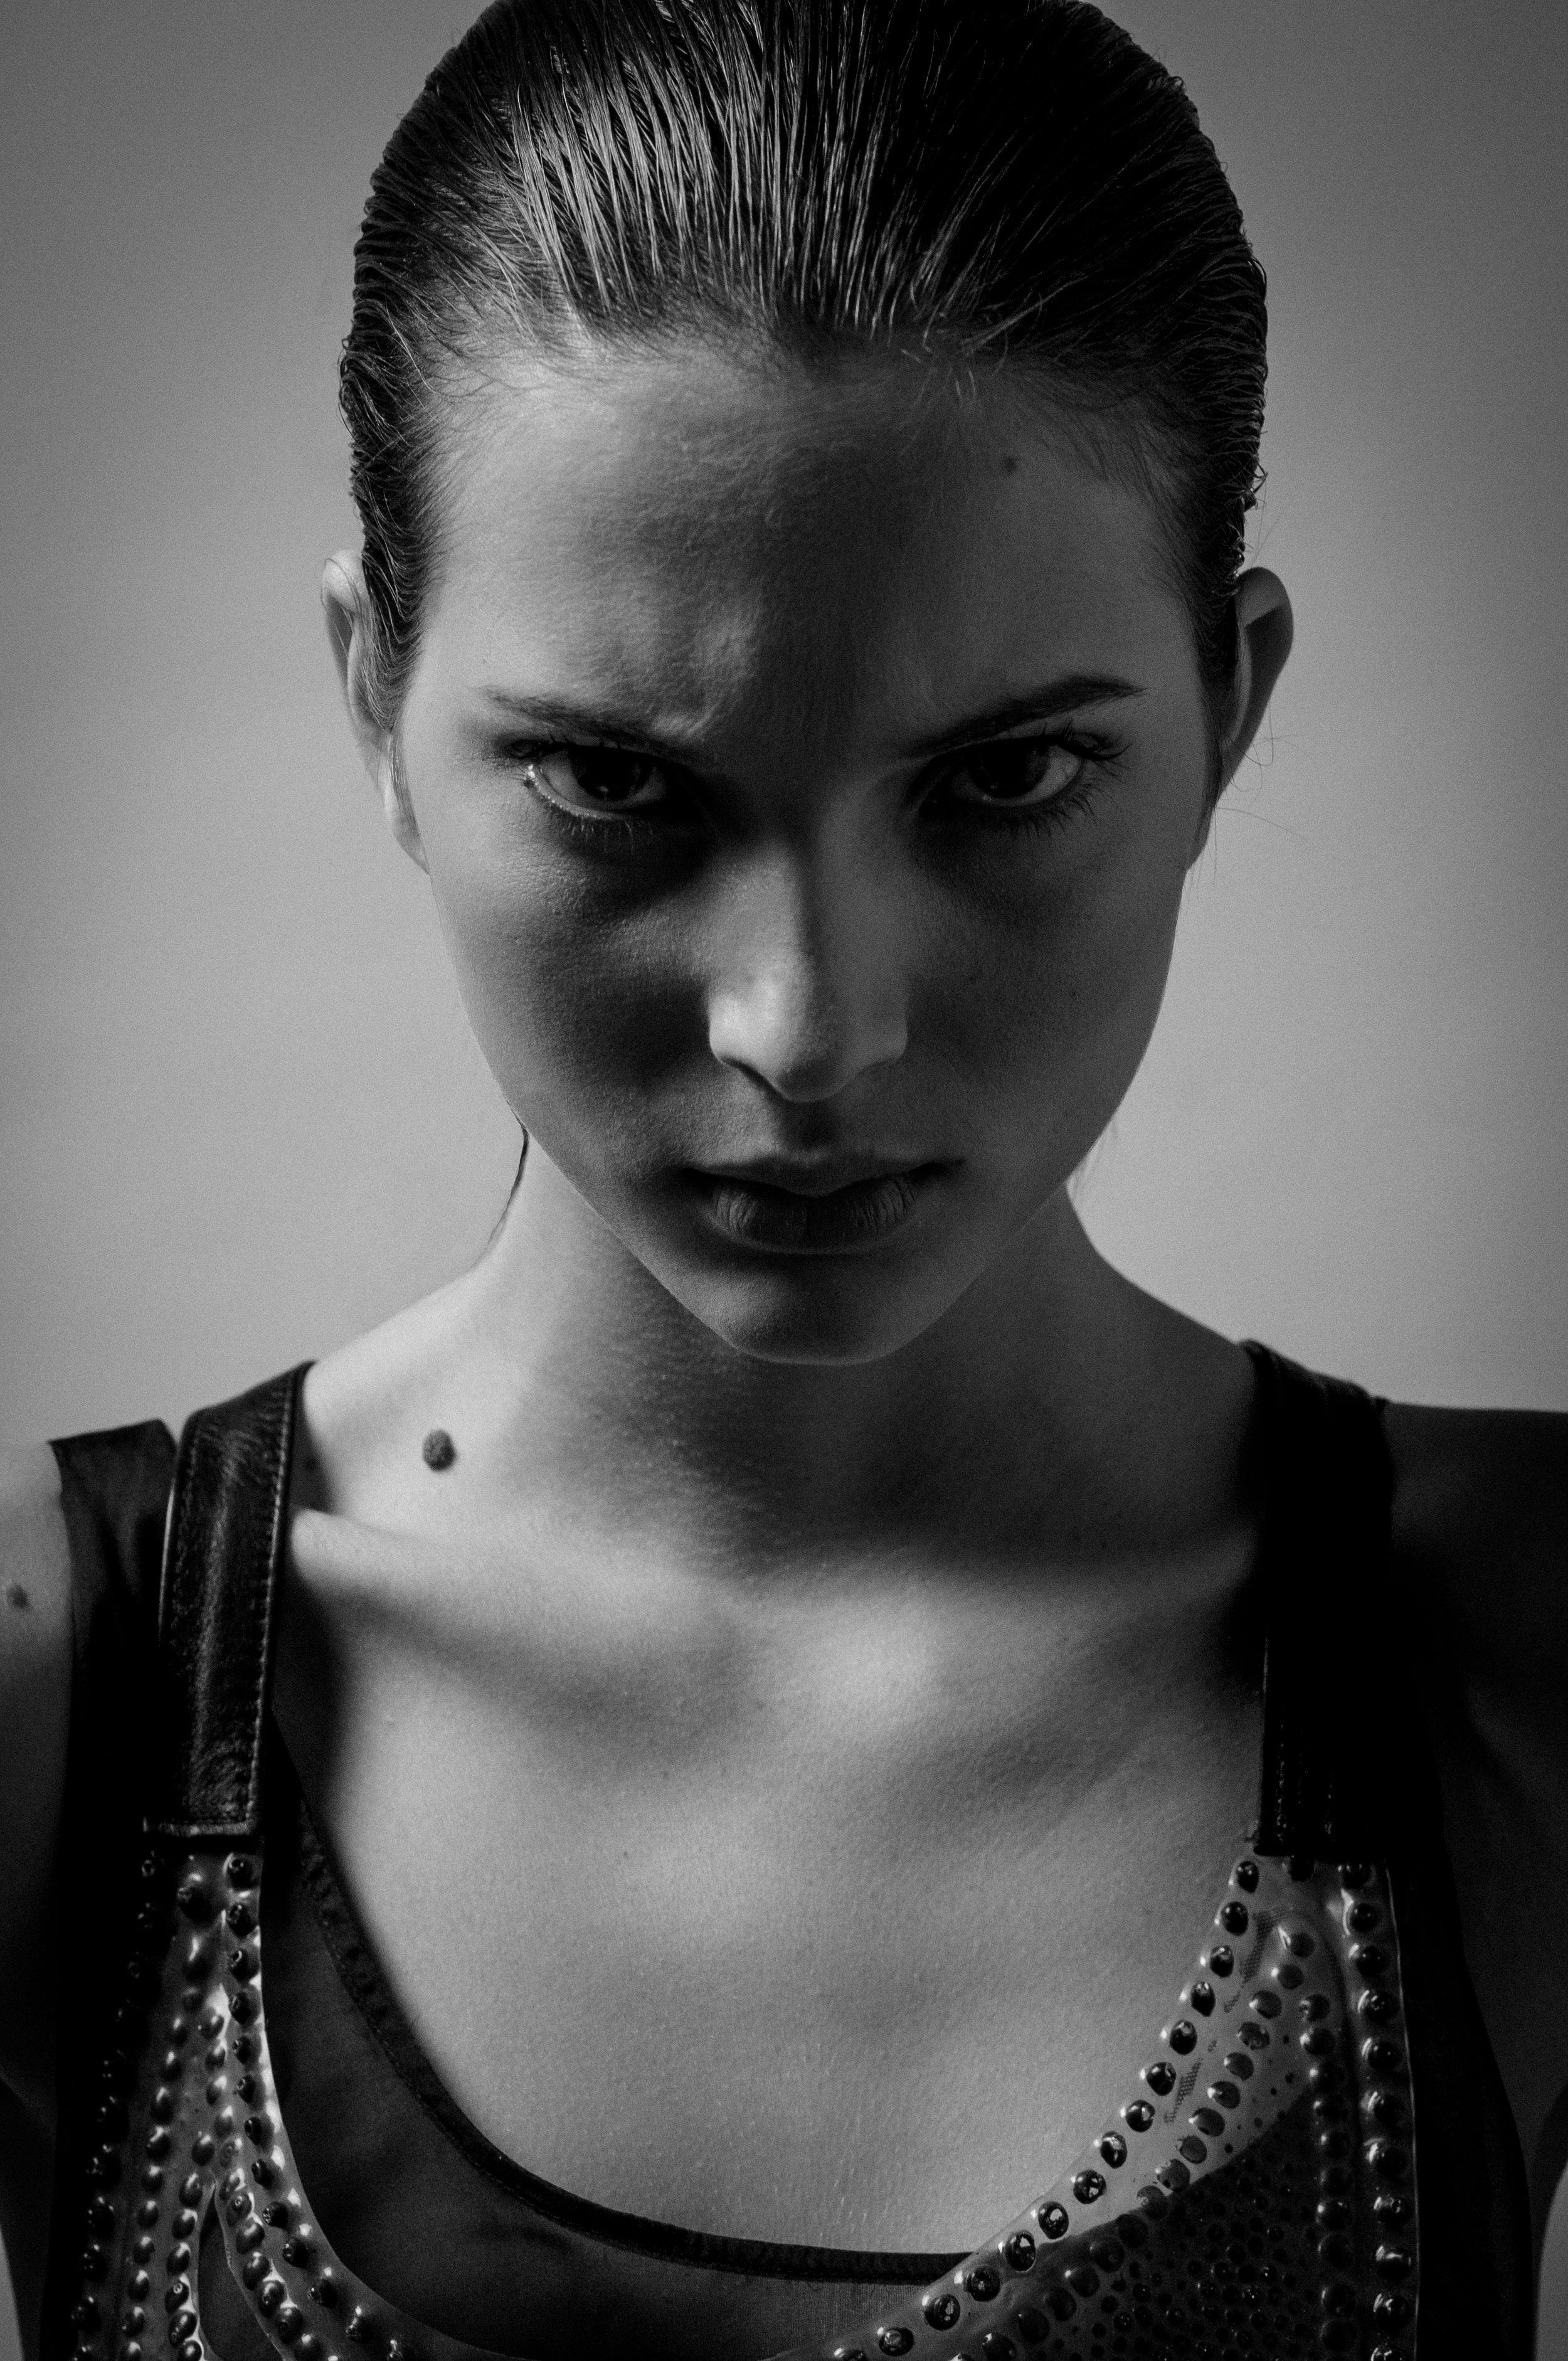 Portraits-64-Edit.jpg